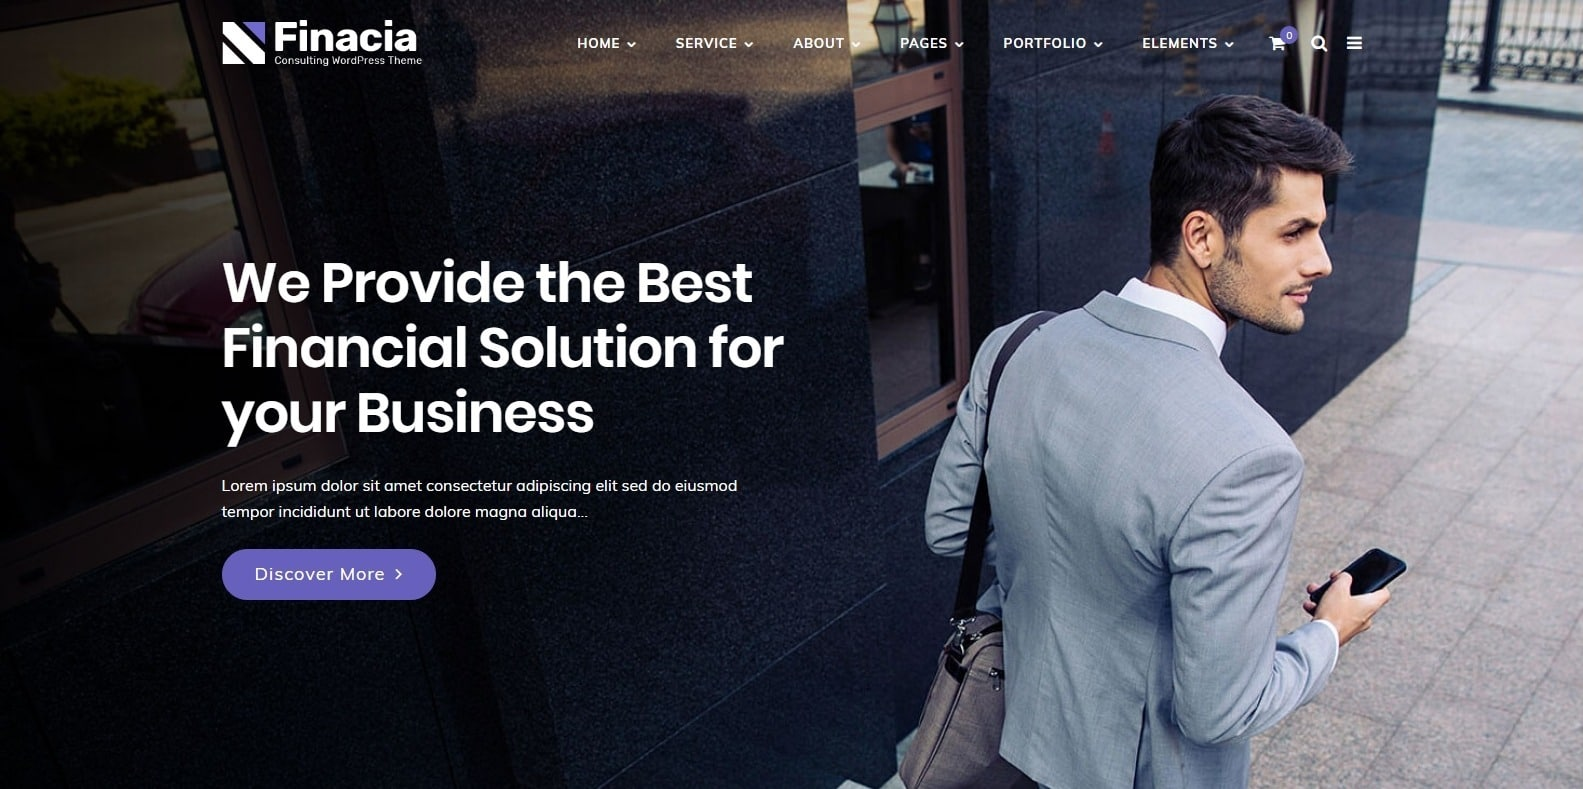 finacia-finance-webaite-template